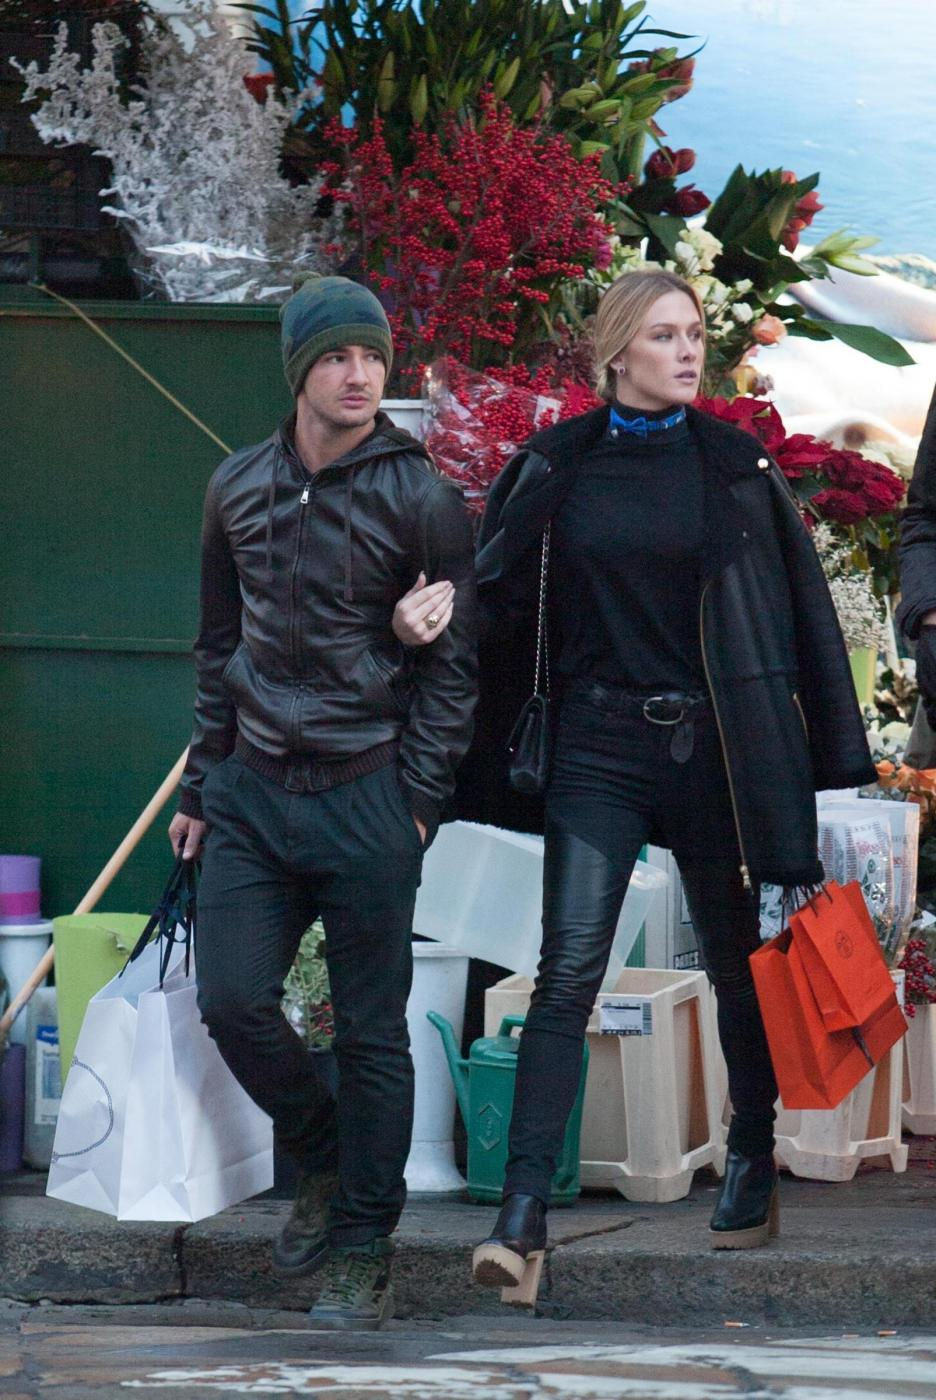 Pato, shopping a Milano con fidanzata Fiorella Mattheis3